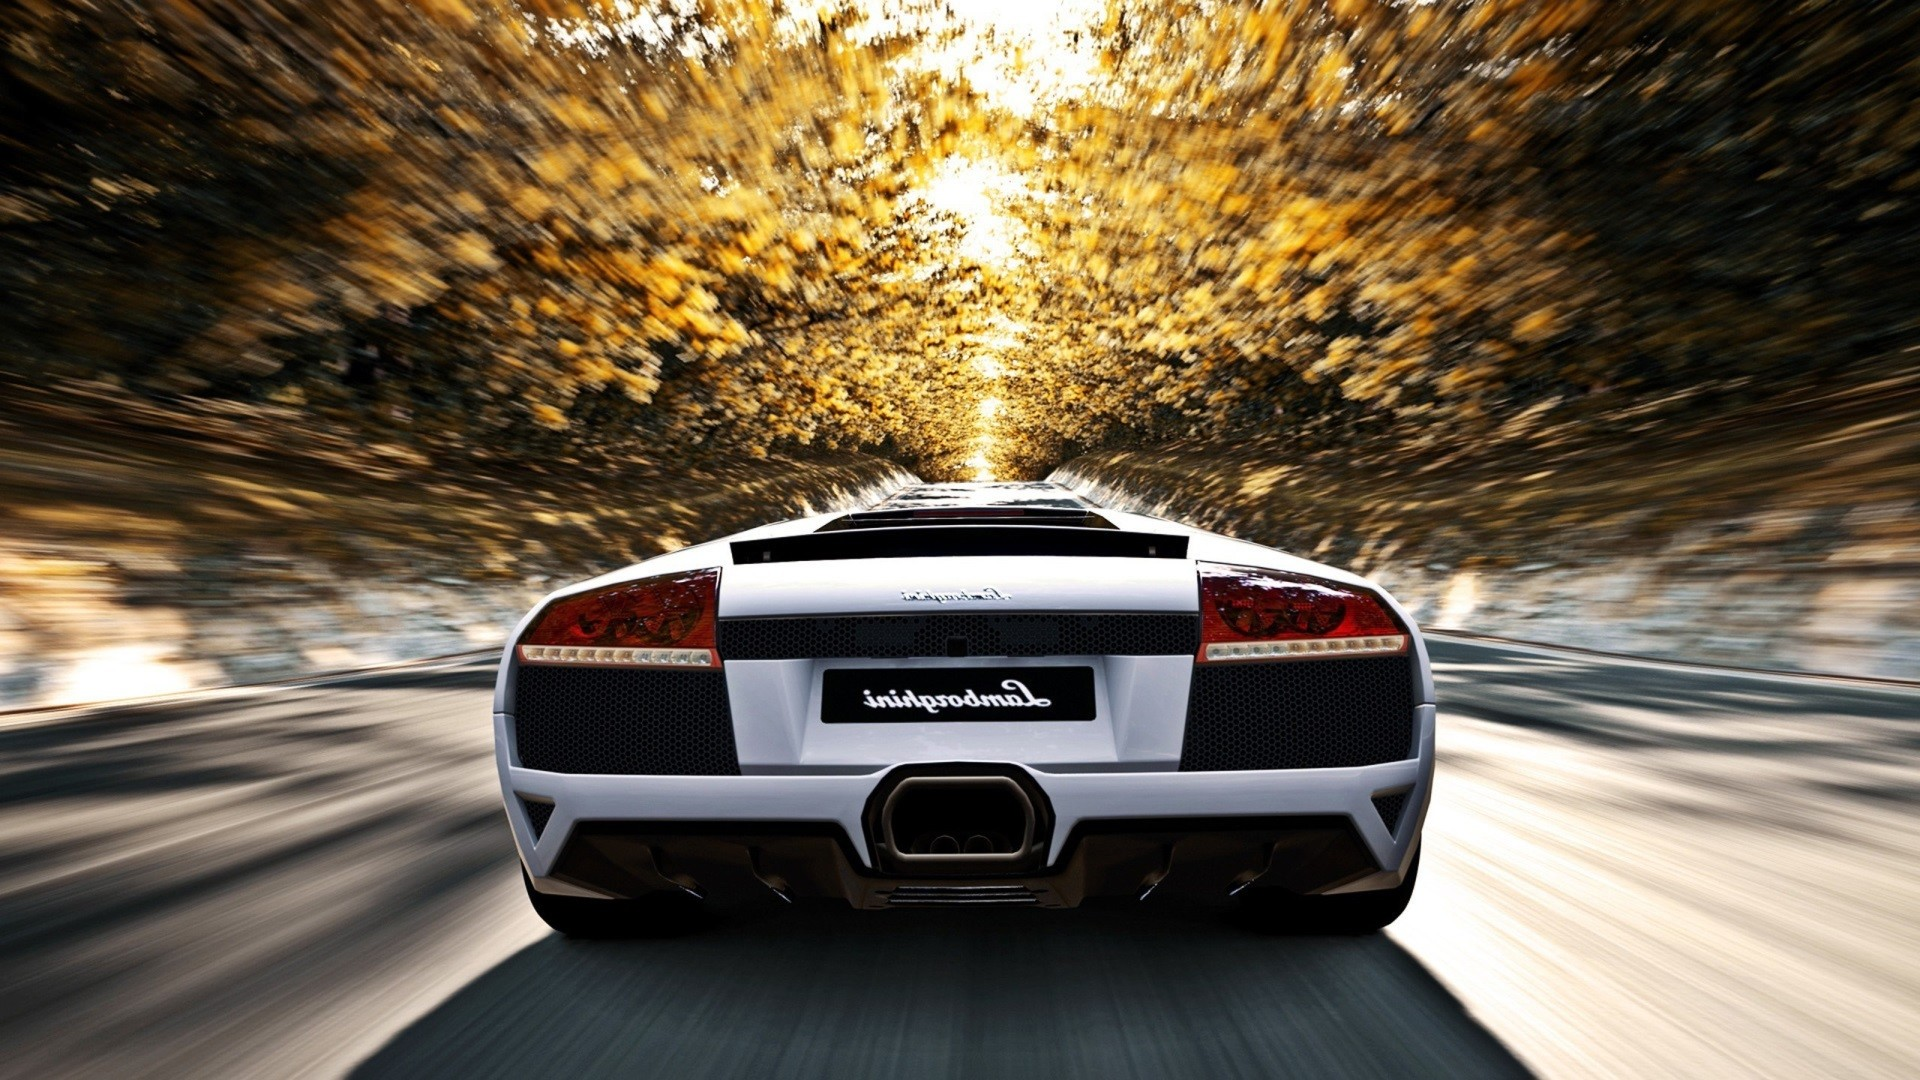 Lamborghini Wallpaper 1920x1080 (72+ images)